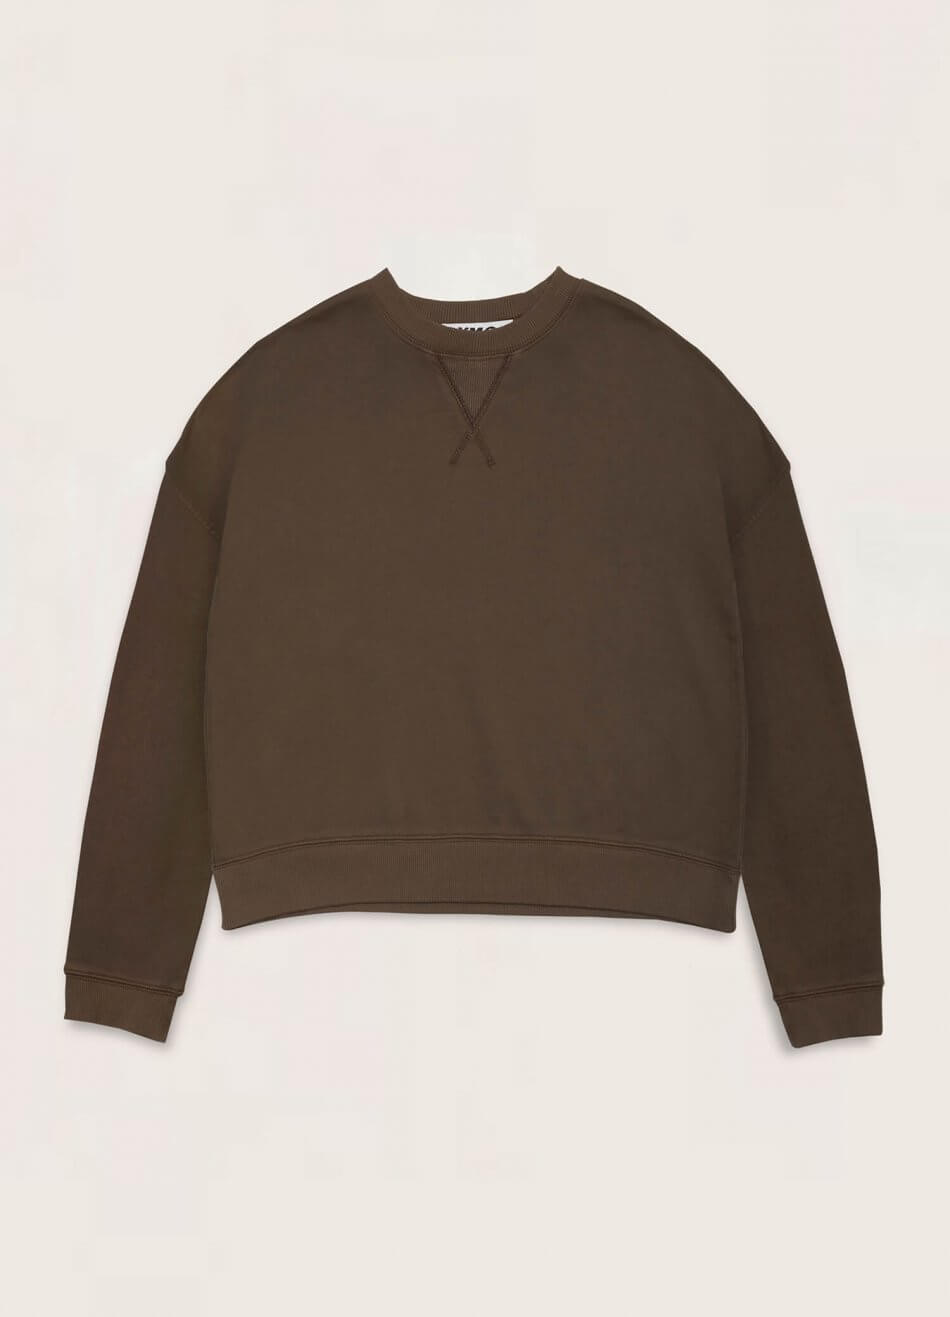 Almost Grown Cotton Loopback Sweatshirt Olive